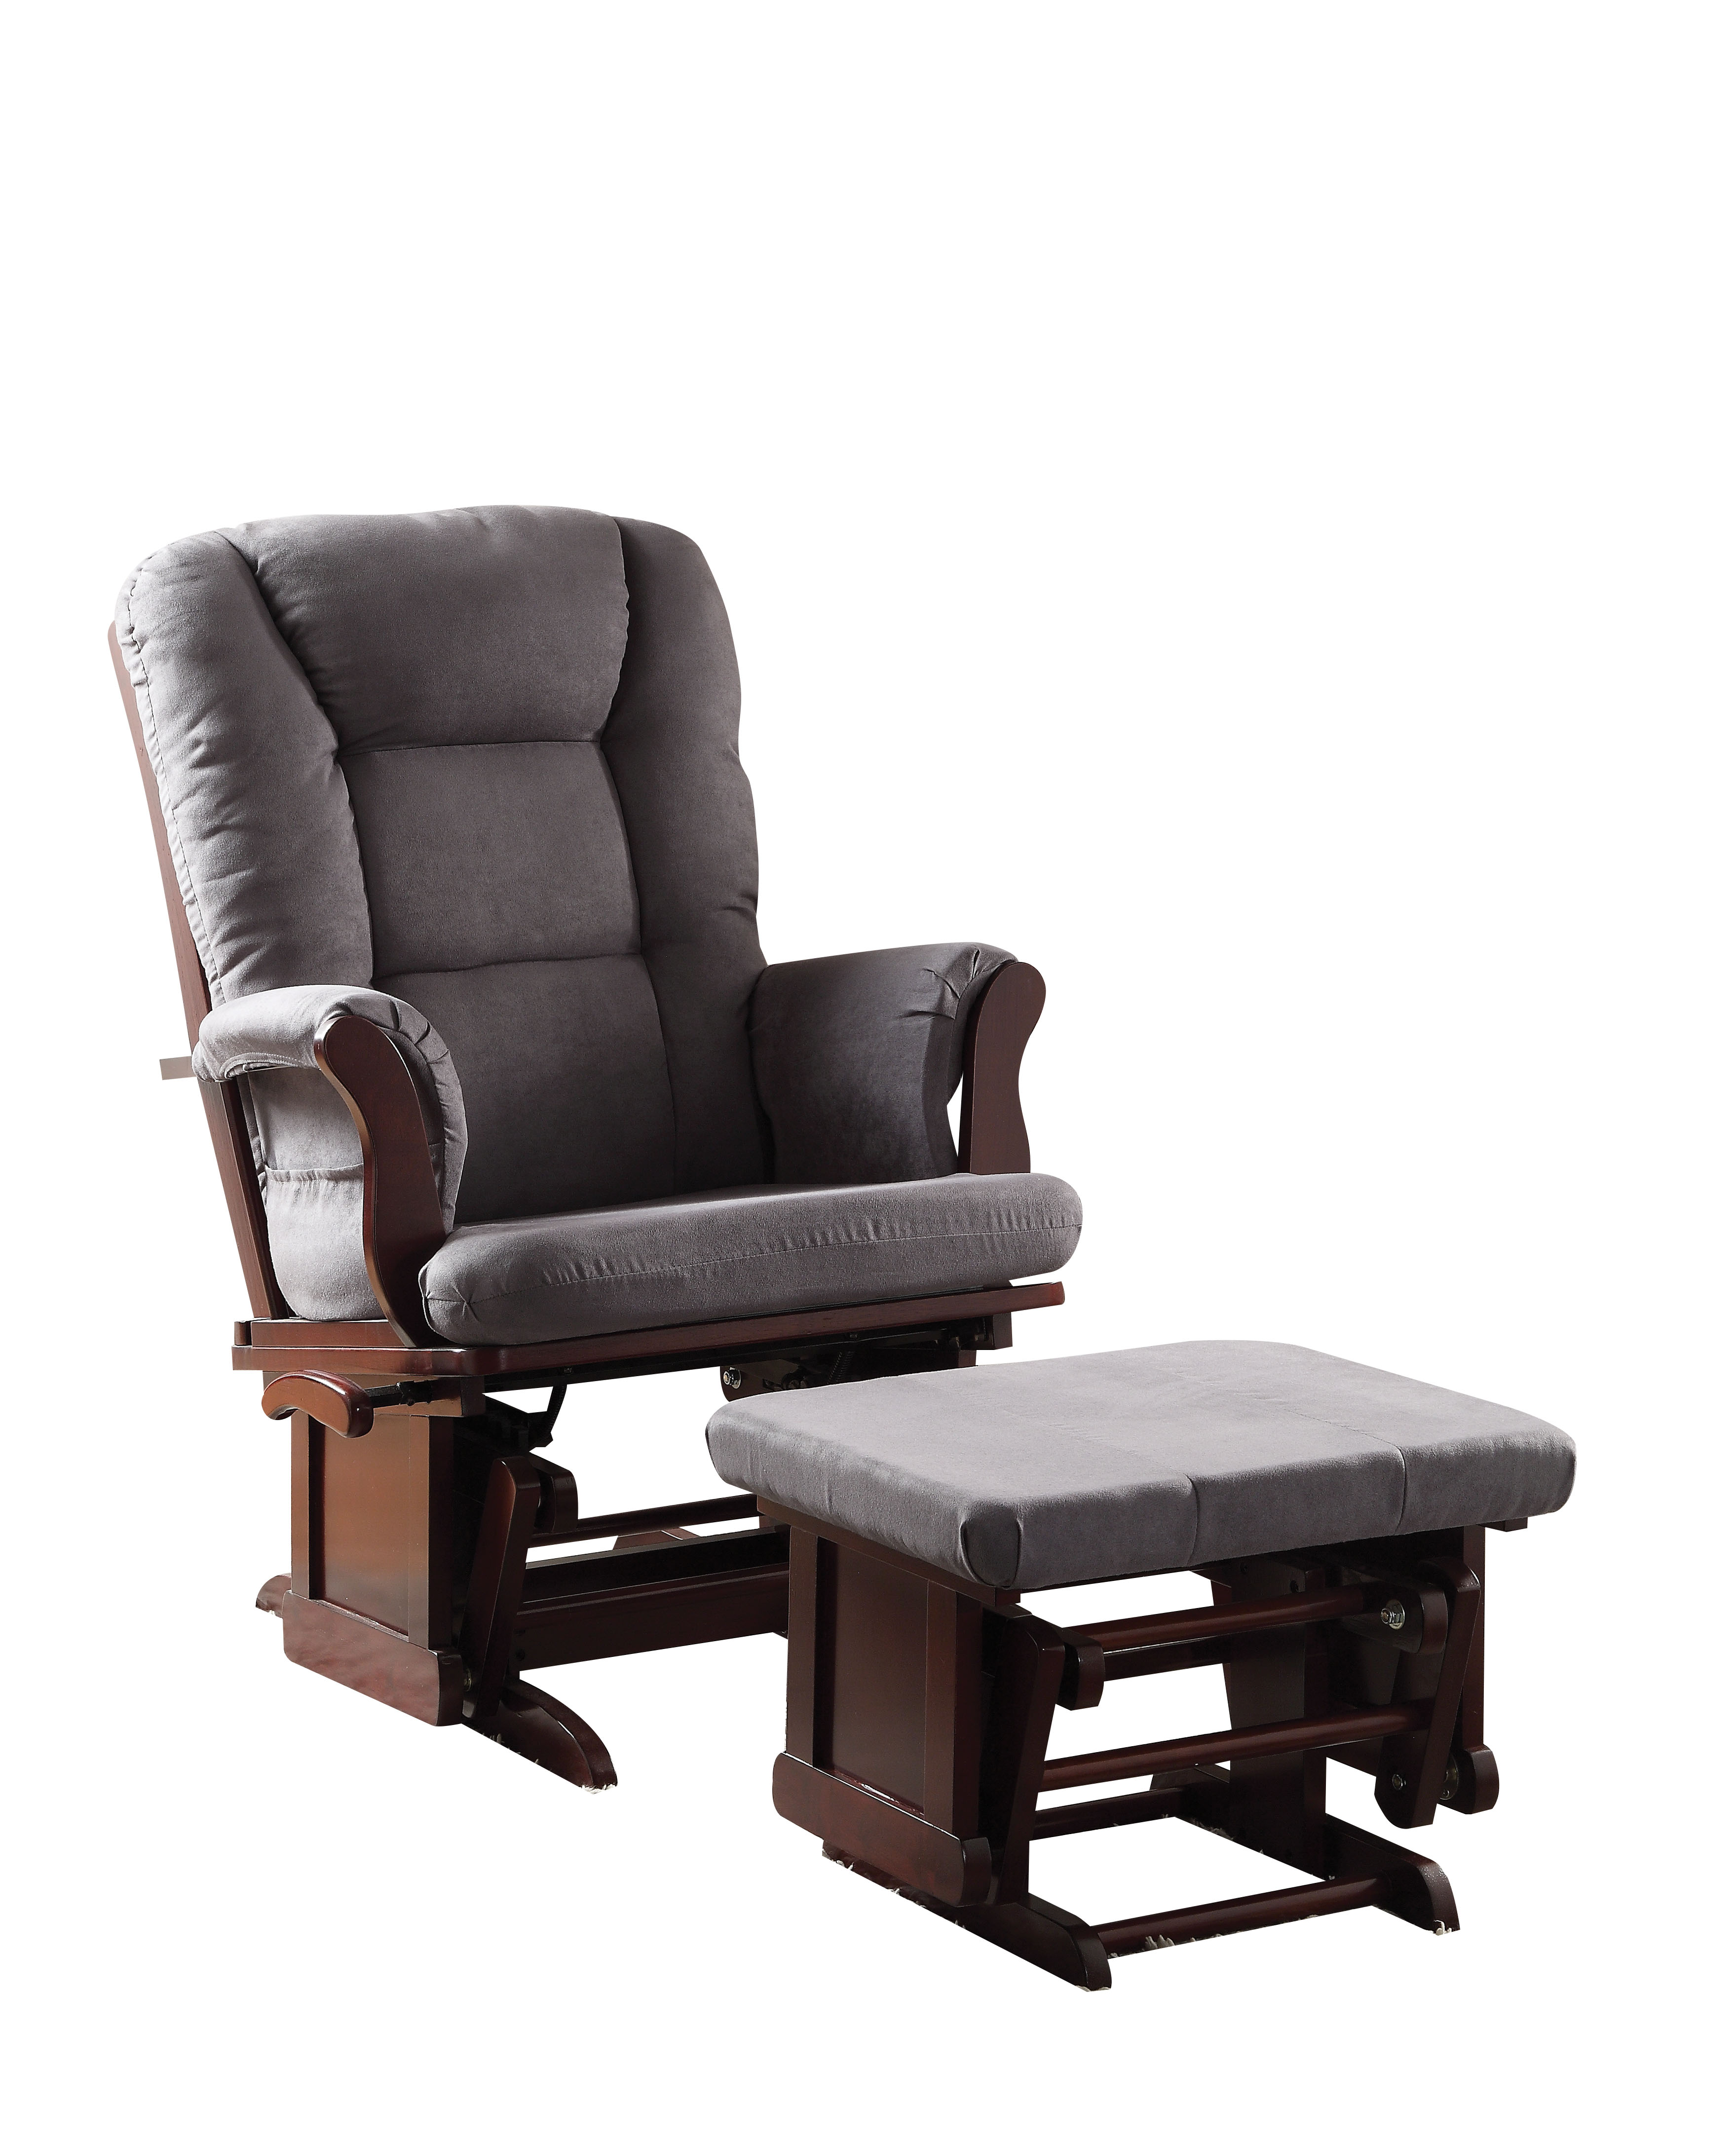 ACME Aeron 2-Piece Pack Glider Chair & Ottoman, Gray Microfiber & Cherry by ACME Furniture